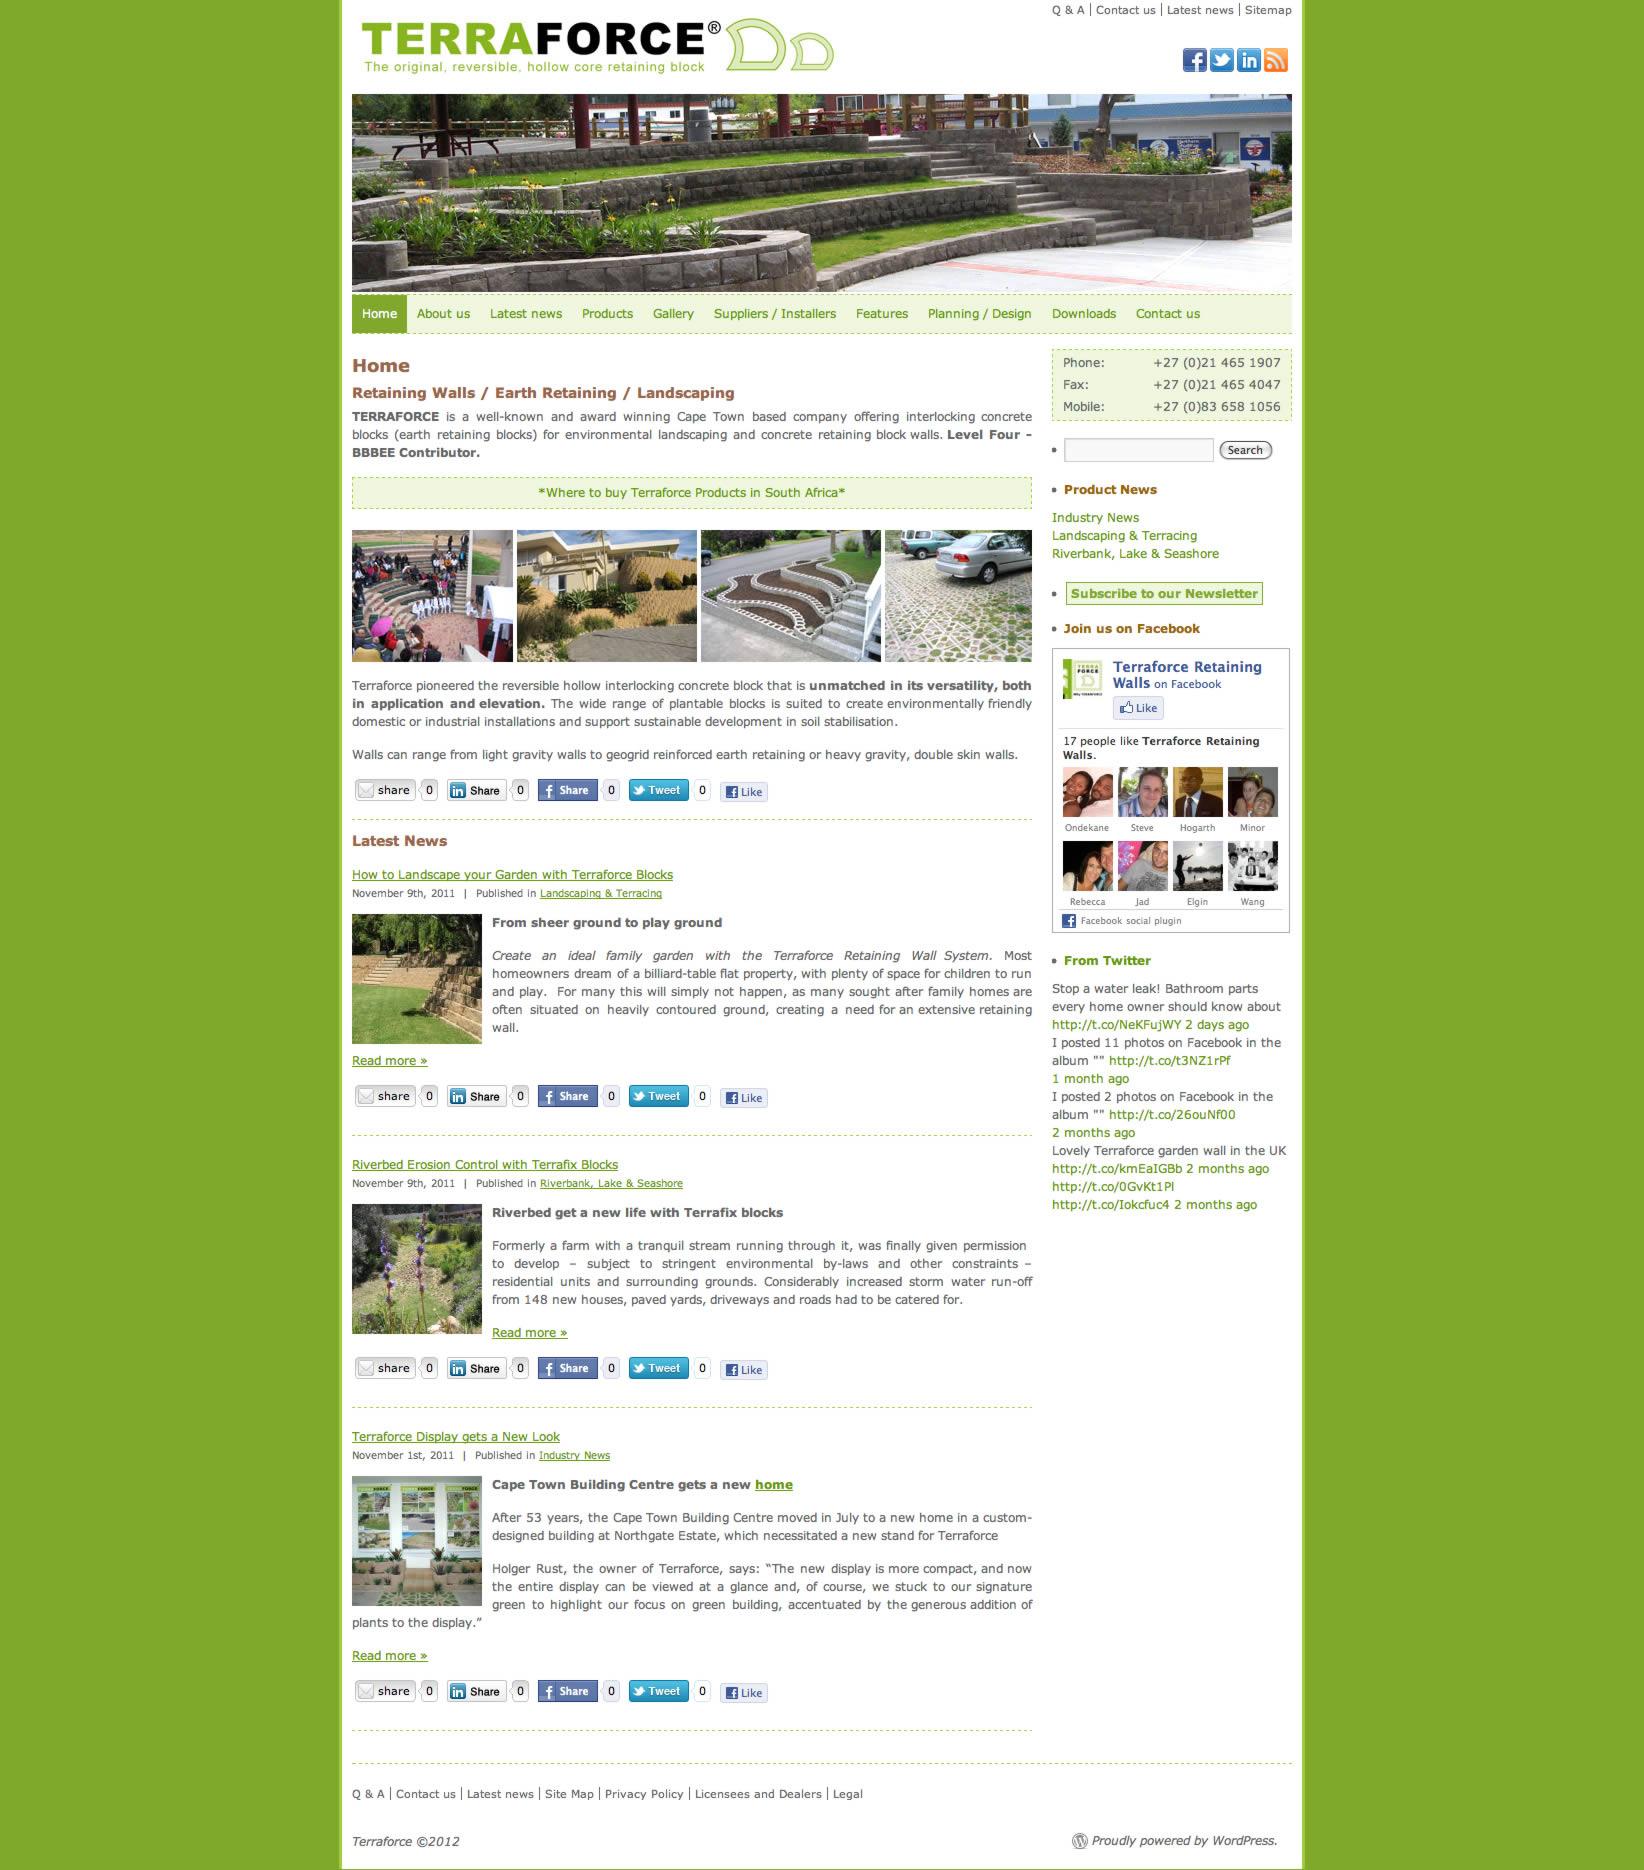 Terraforce web site